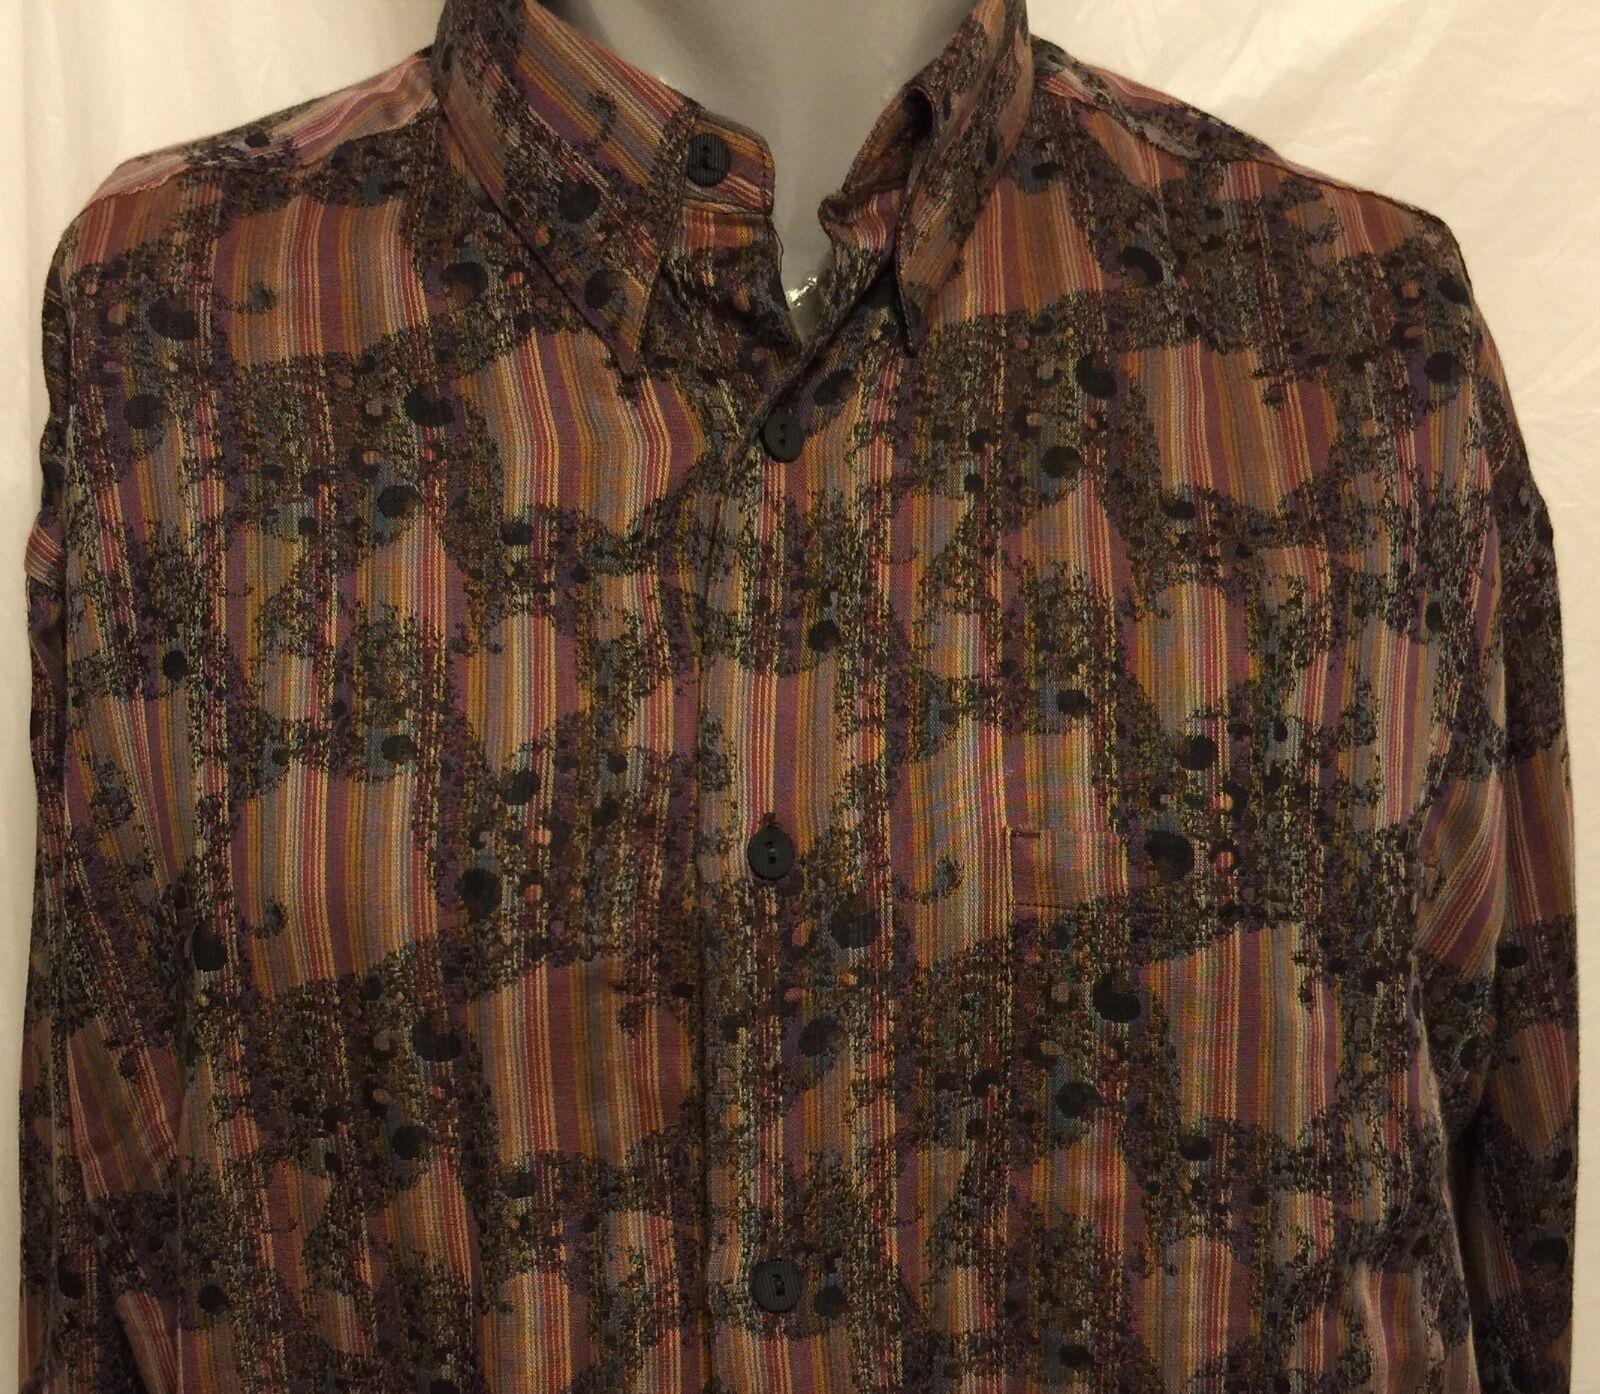 VTG Jhane Barnes Multi-color Striped Pattern Shirt Size Medium Club Party Social